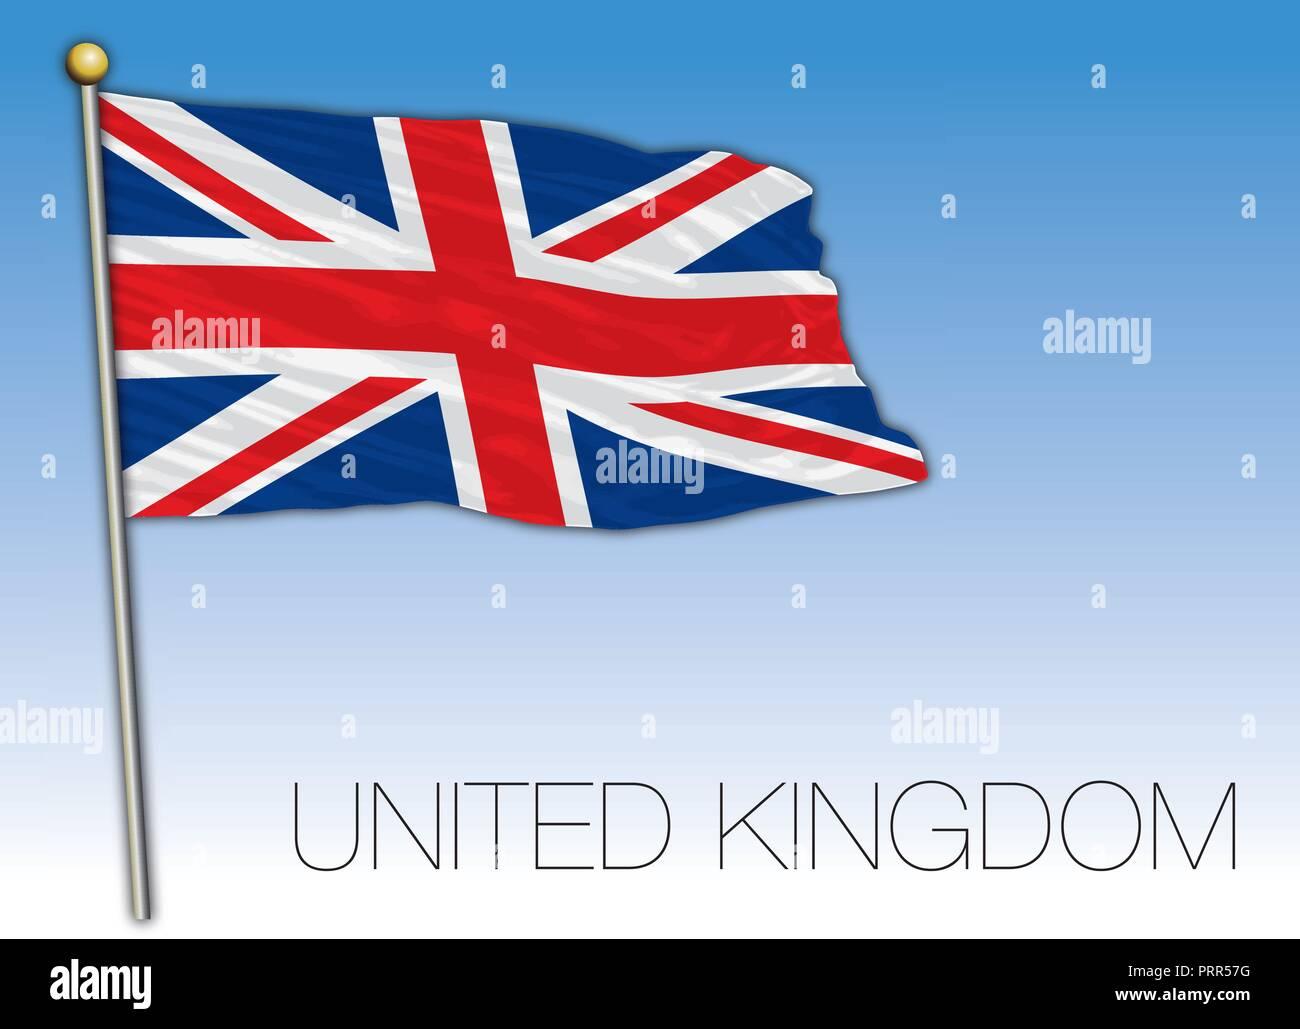 United Kingdom official flag, vector illustration - Stock Vector